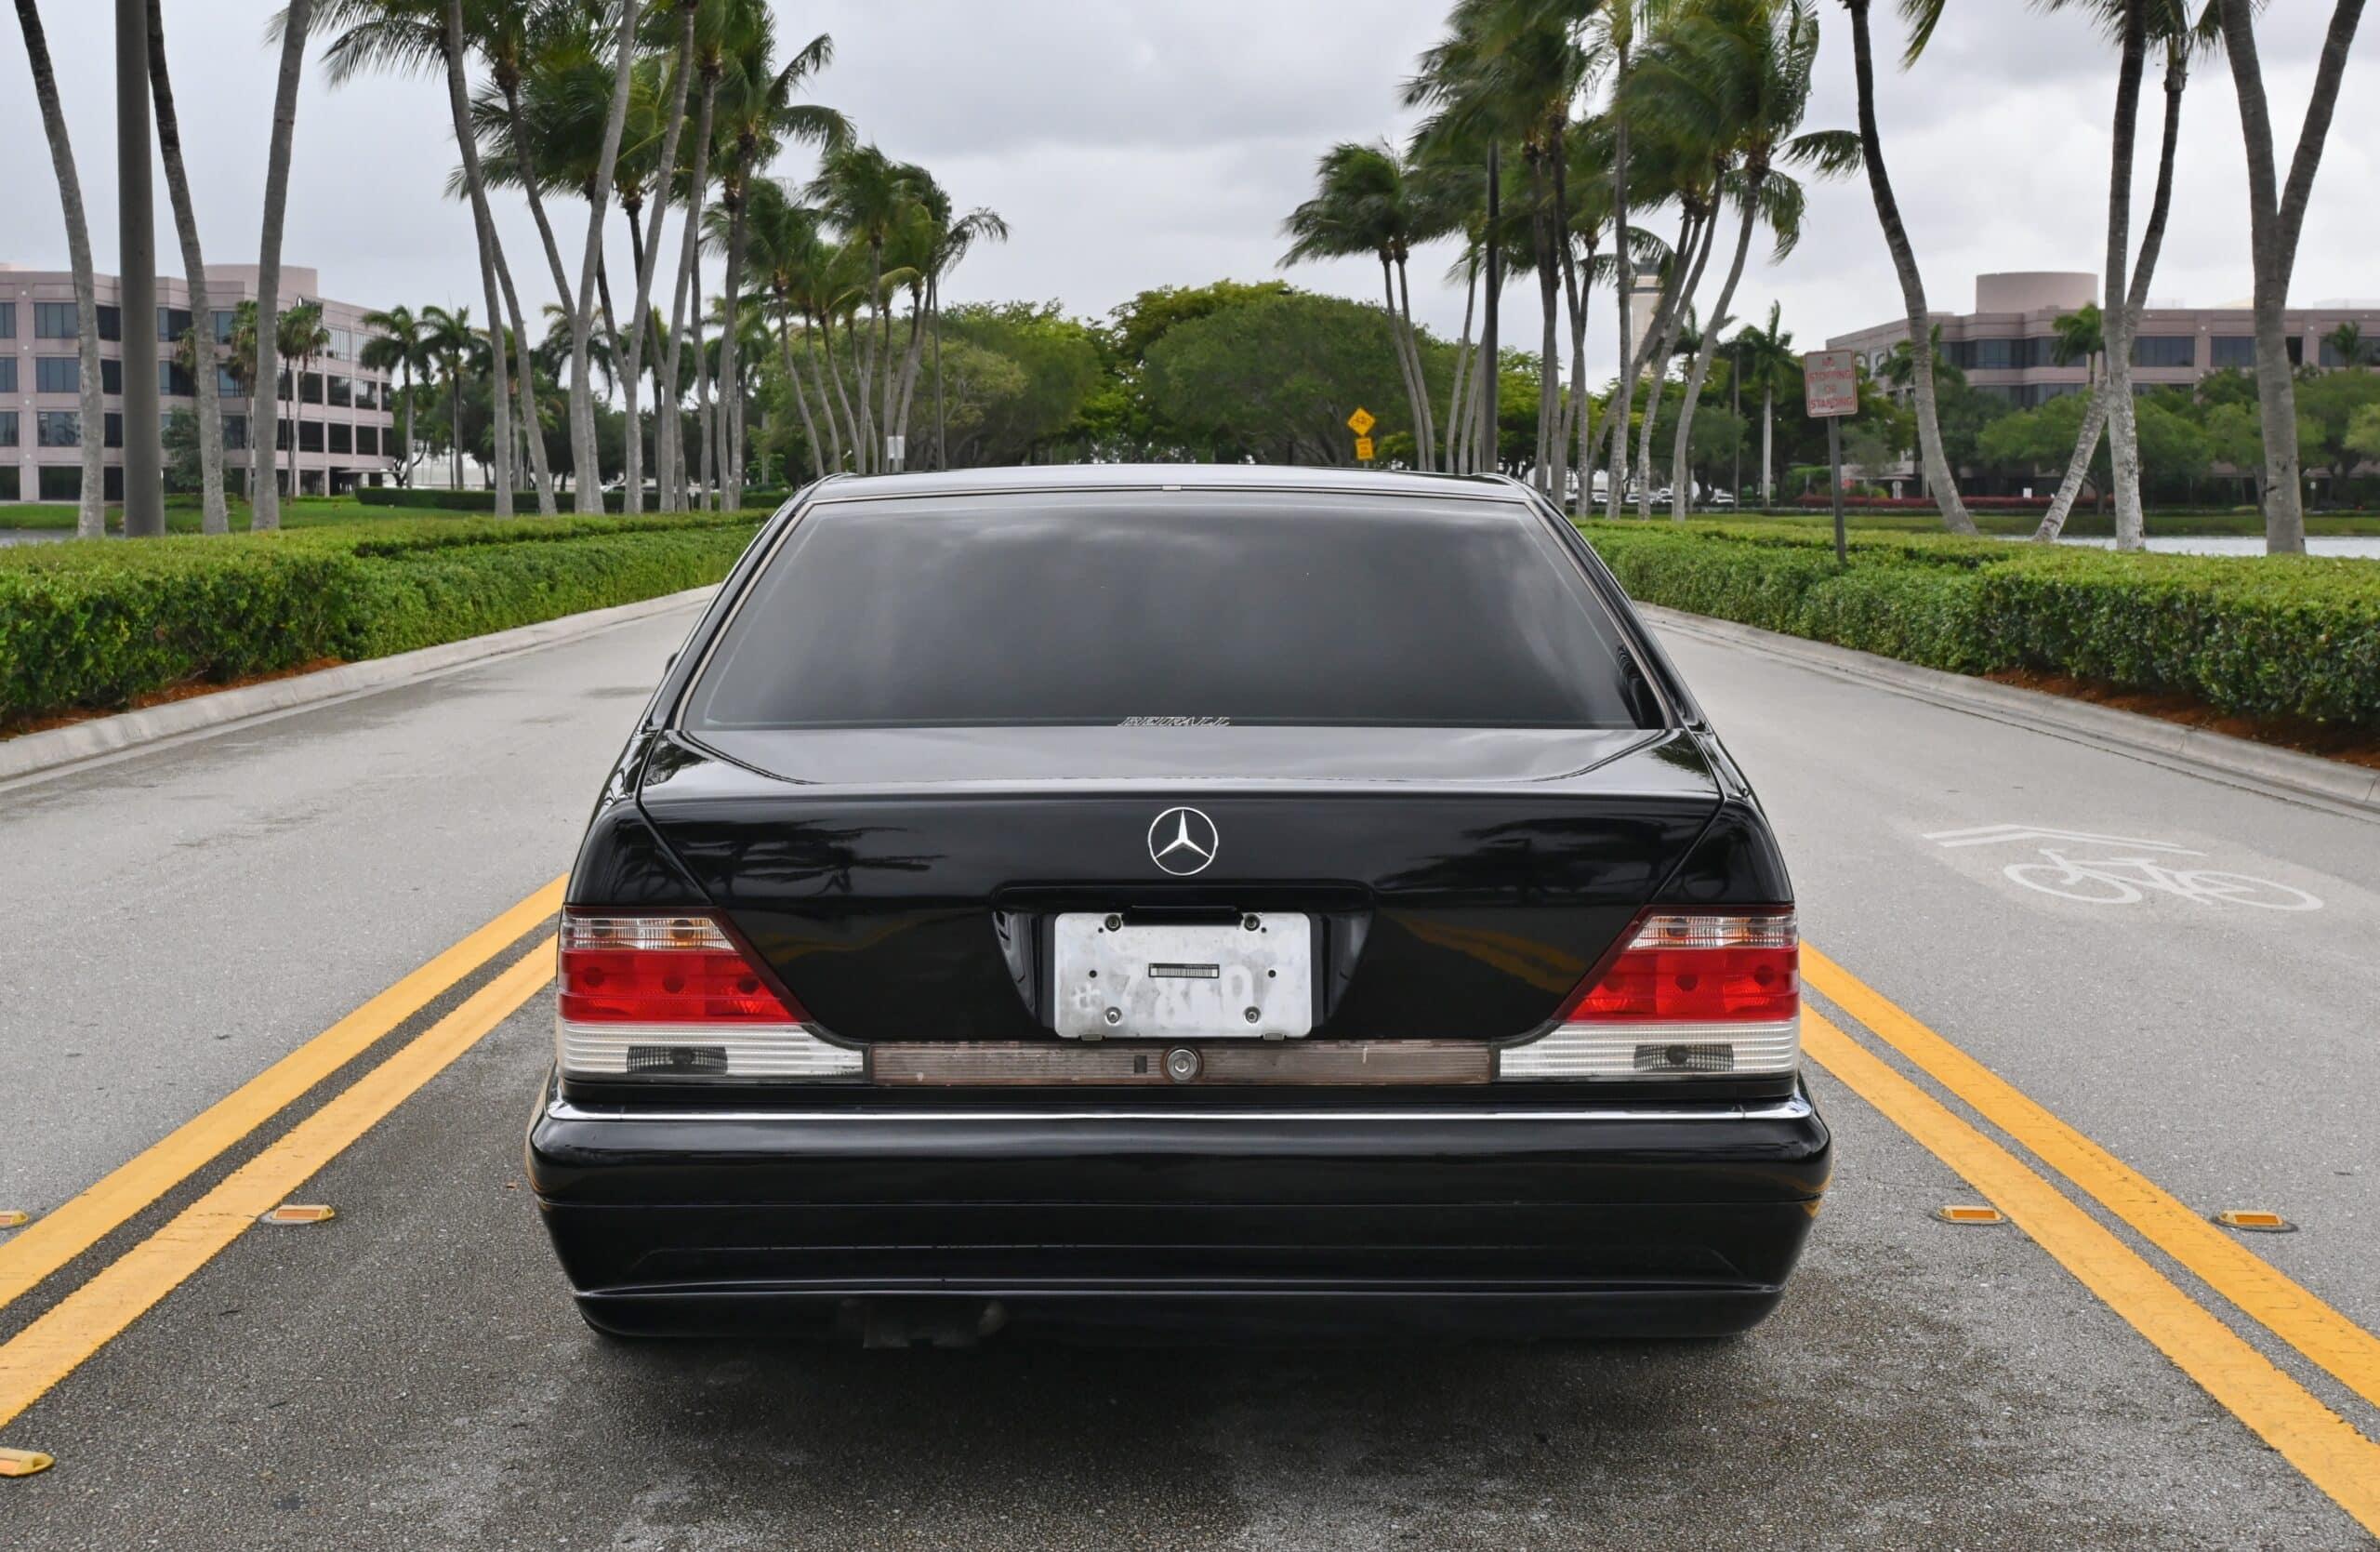 1994 Mercedes-Benz S-Class S600 W140 Lorinser Modified – V12 – European Model – Only 57K Miles – Original Paint